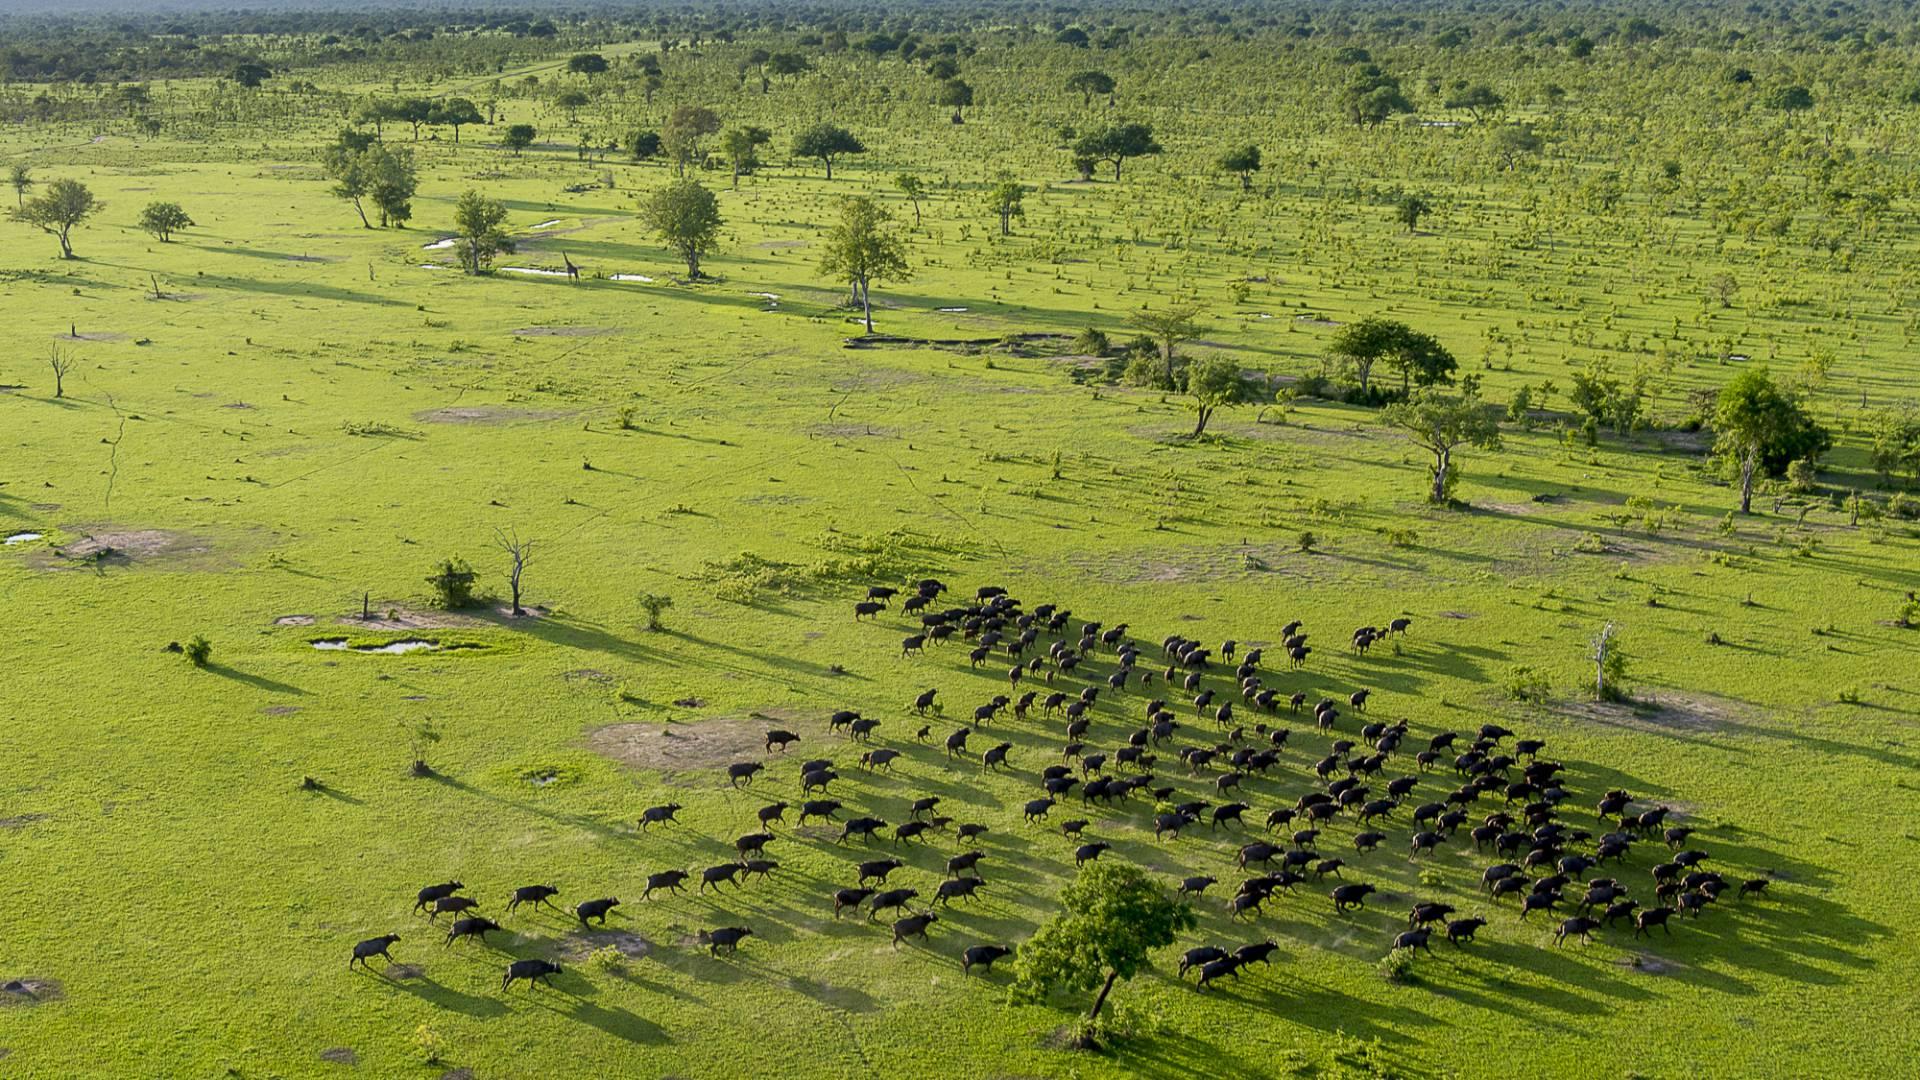 Buffalo im selous wild reservat